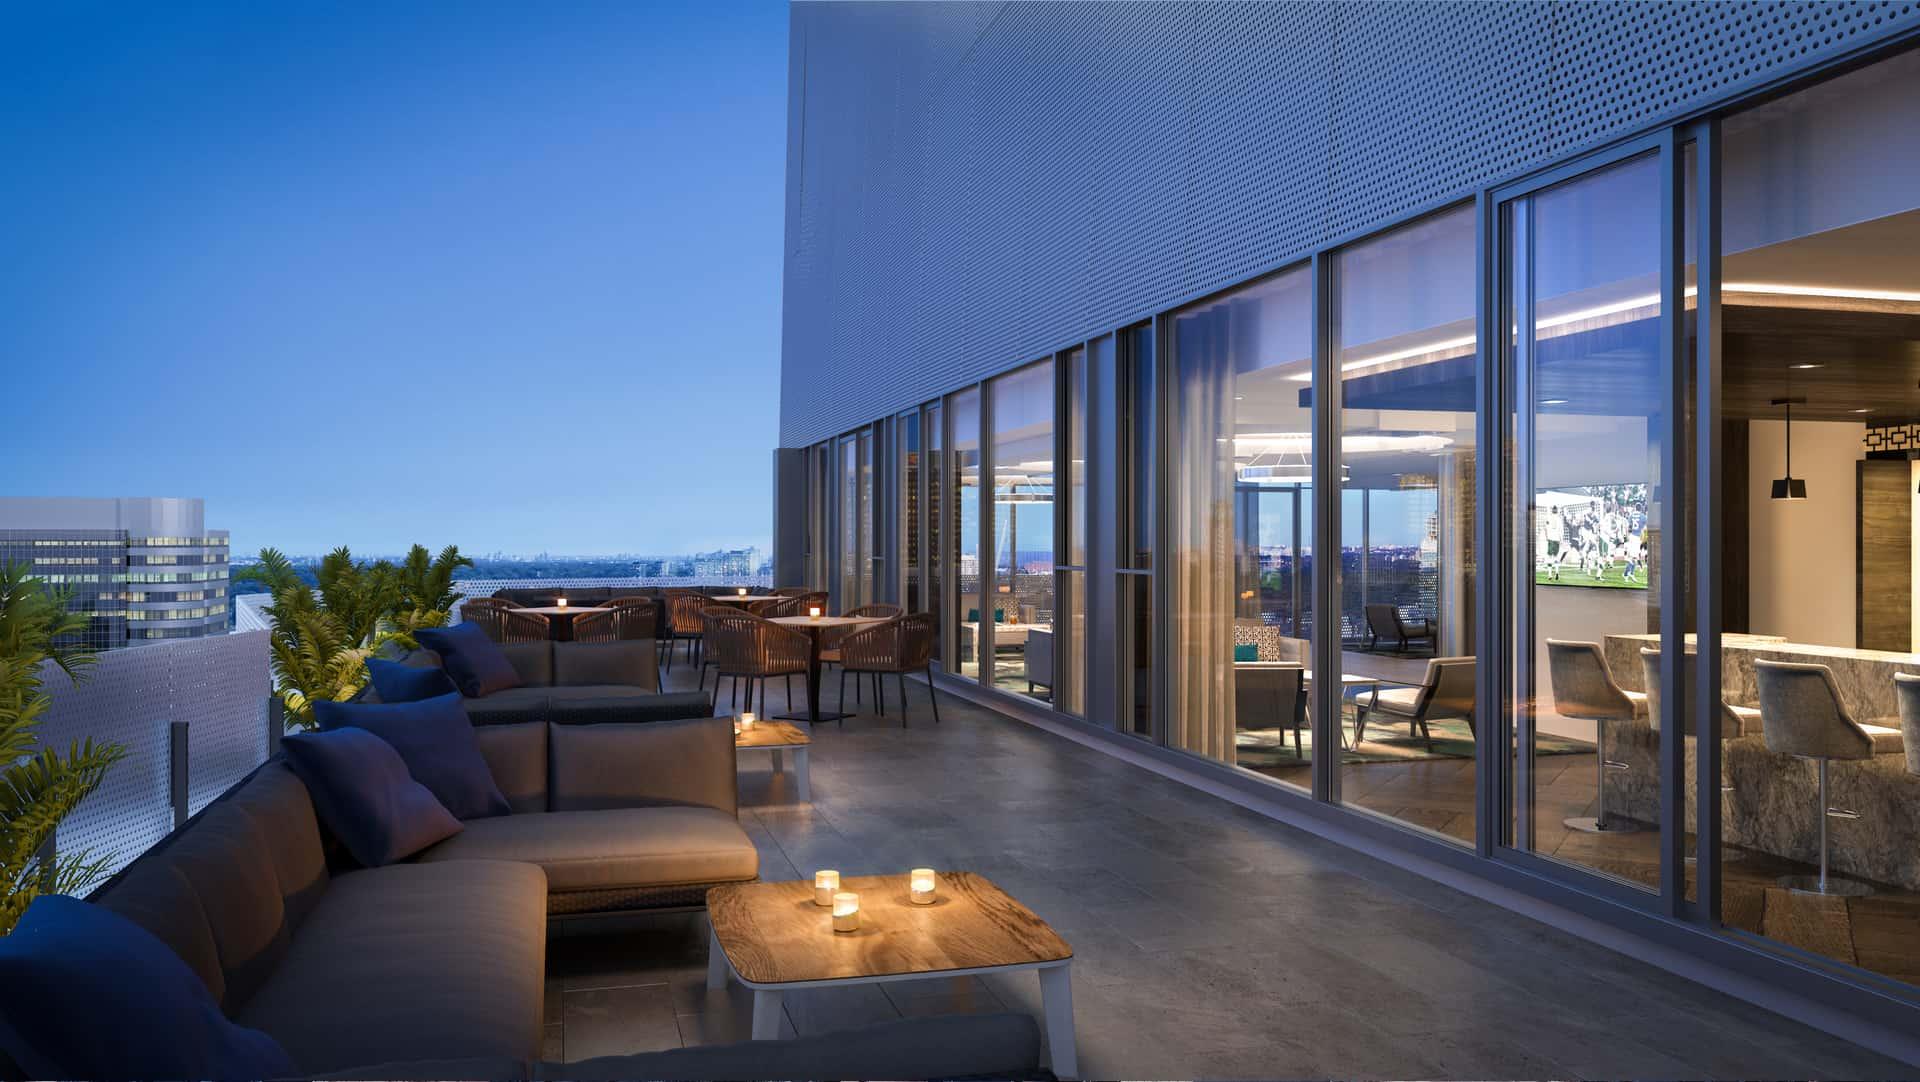 Social condos plans prices platinum vip access for 400 university terrace